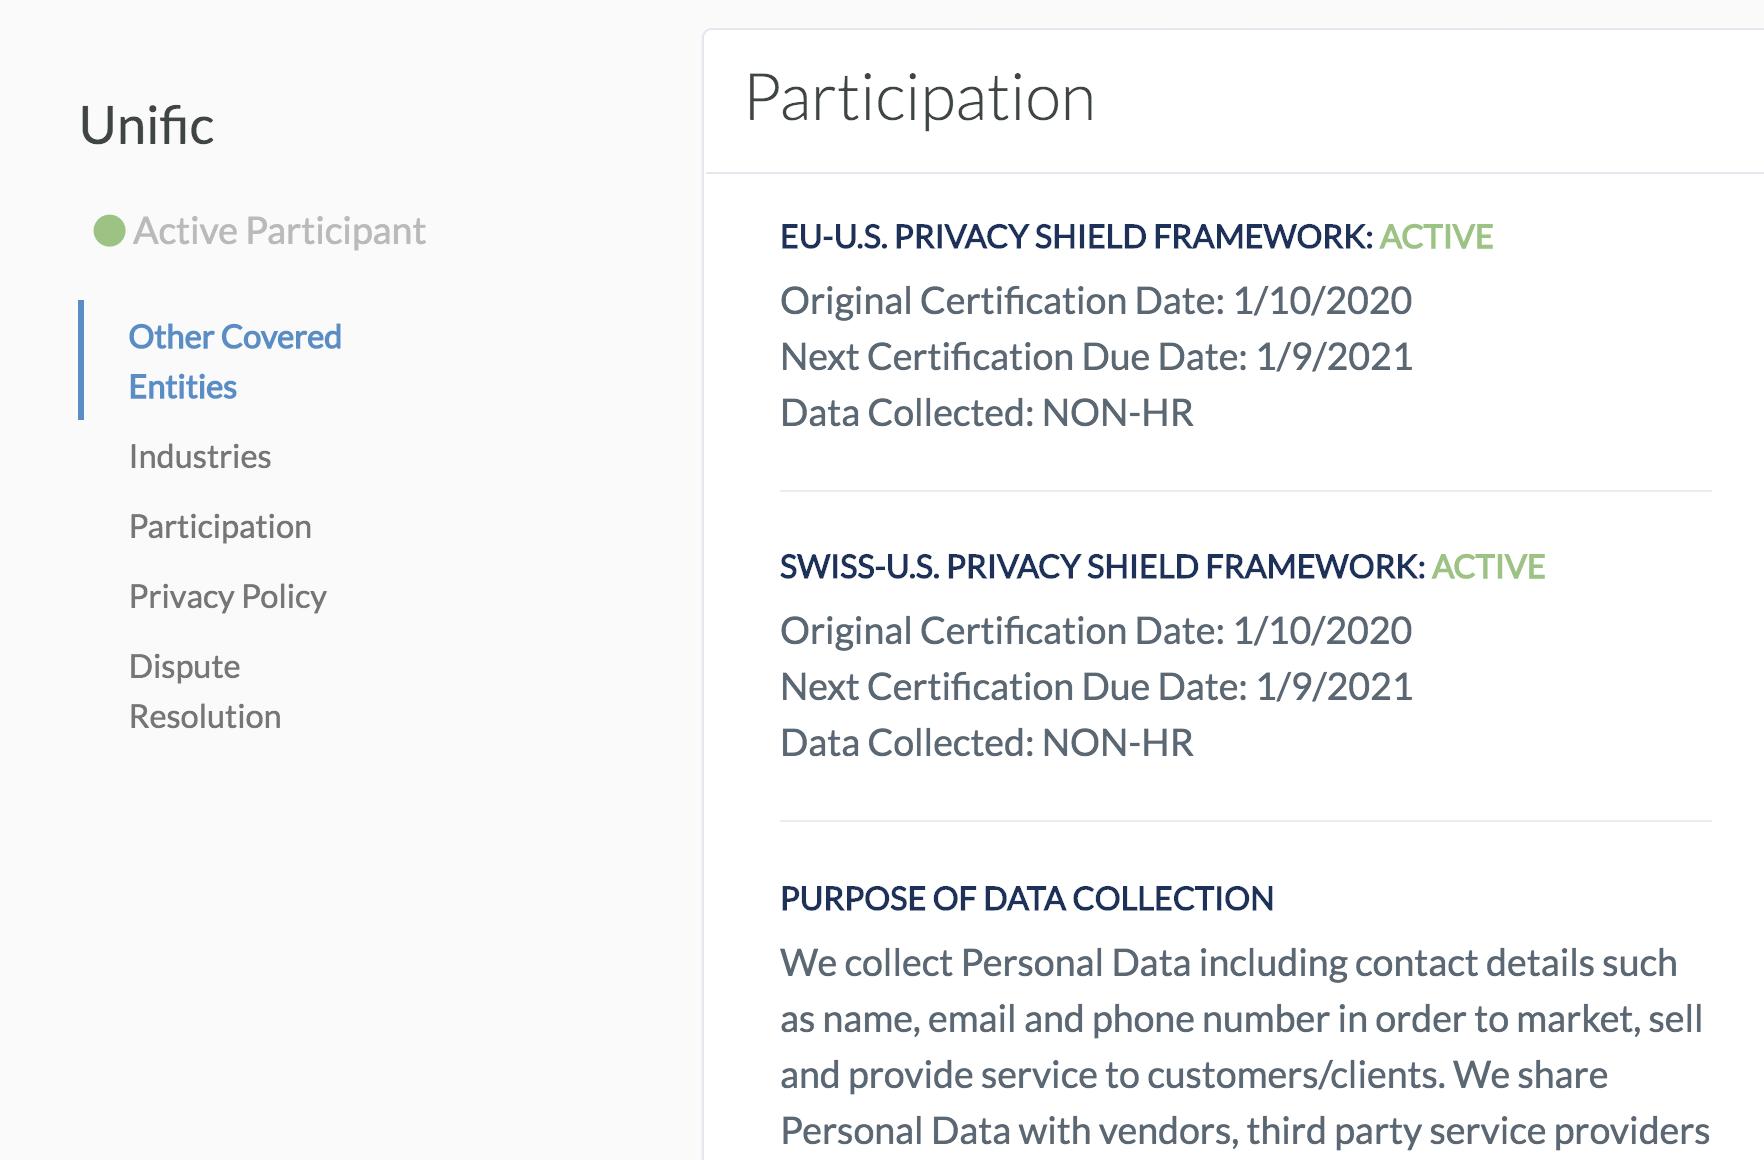 Unific Privacy Shield Certification